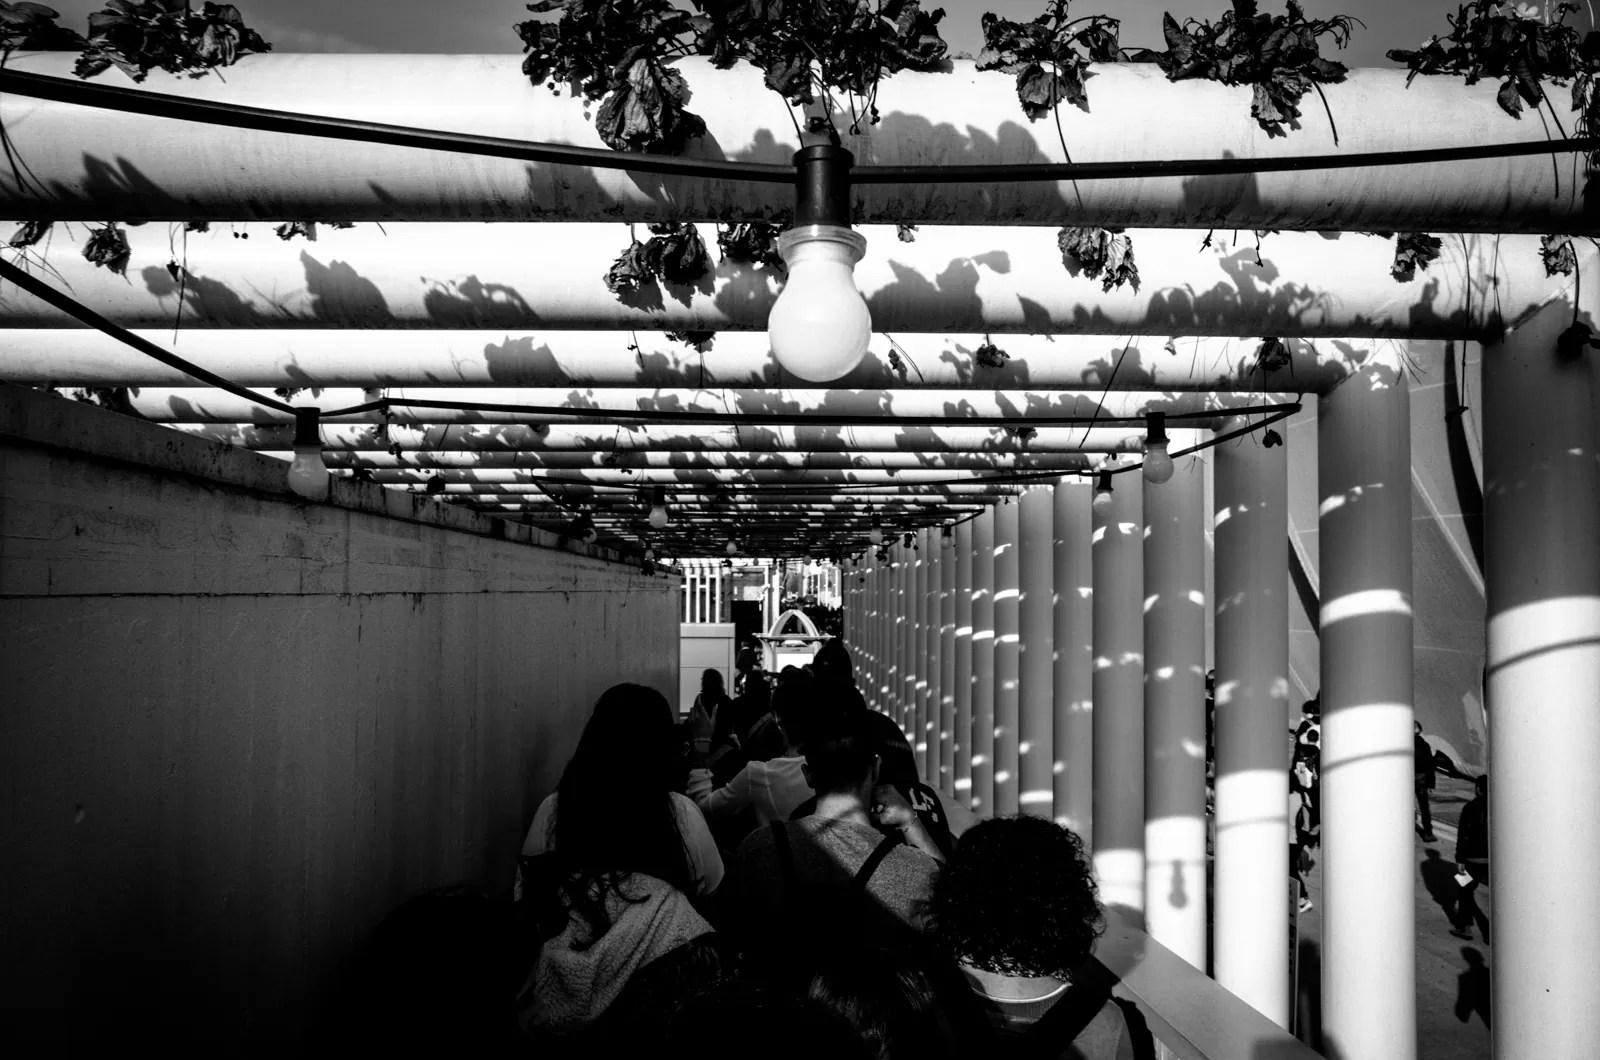 R0011176 - Frapporre in Street Photography - fotostreet.it